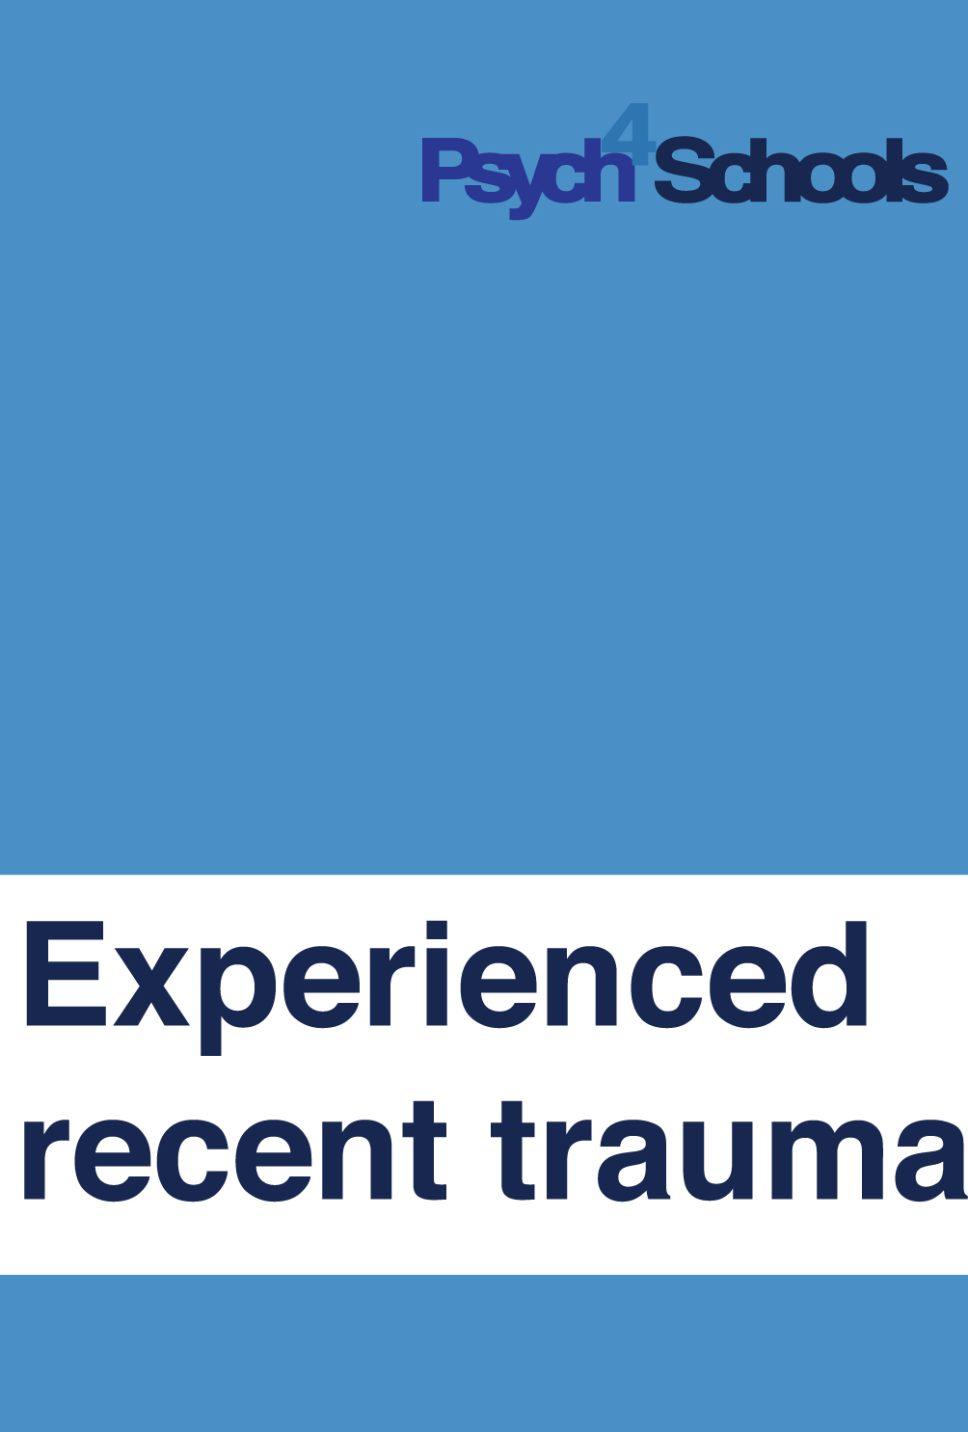 EXPERIENCED-RECENT-TRAUMA